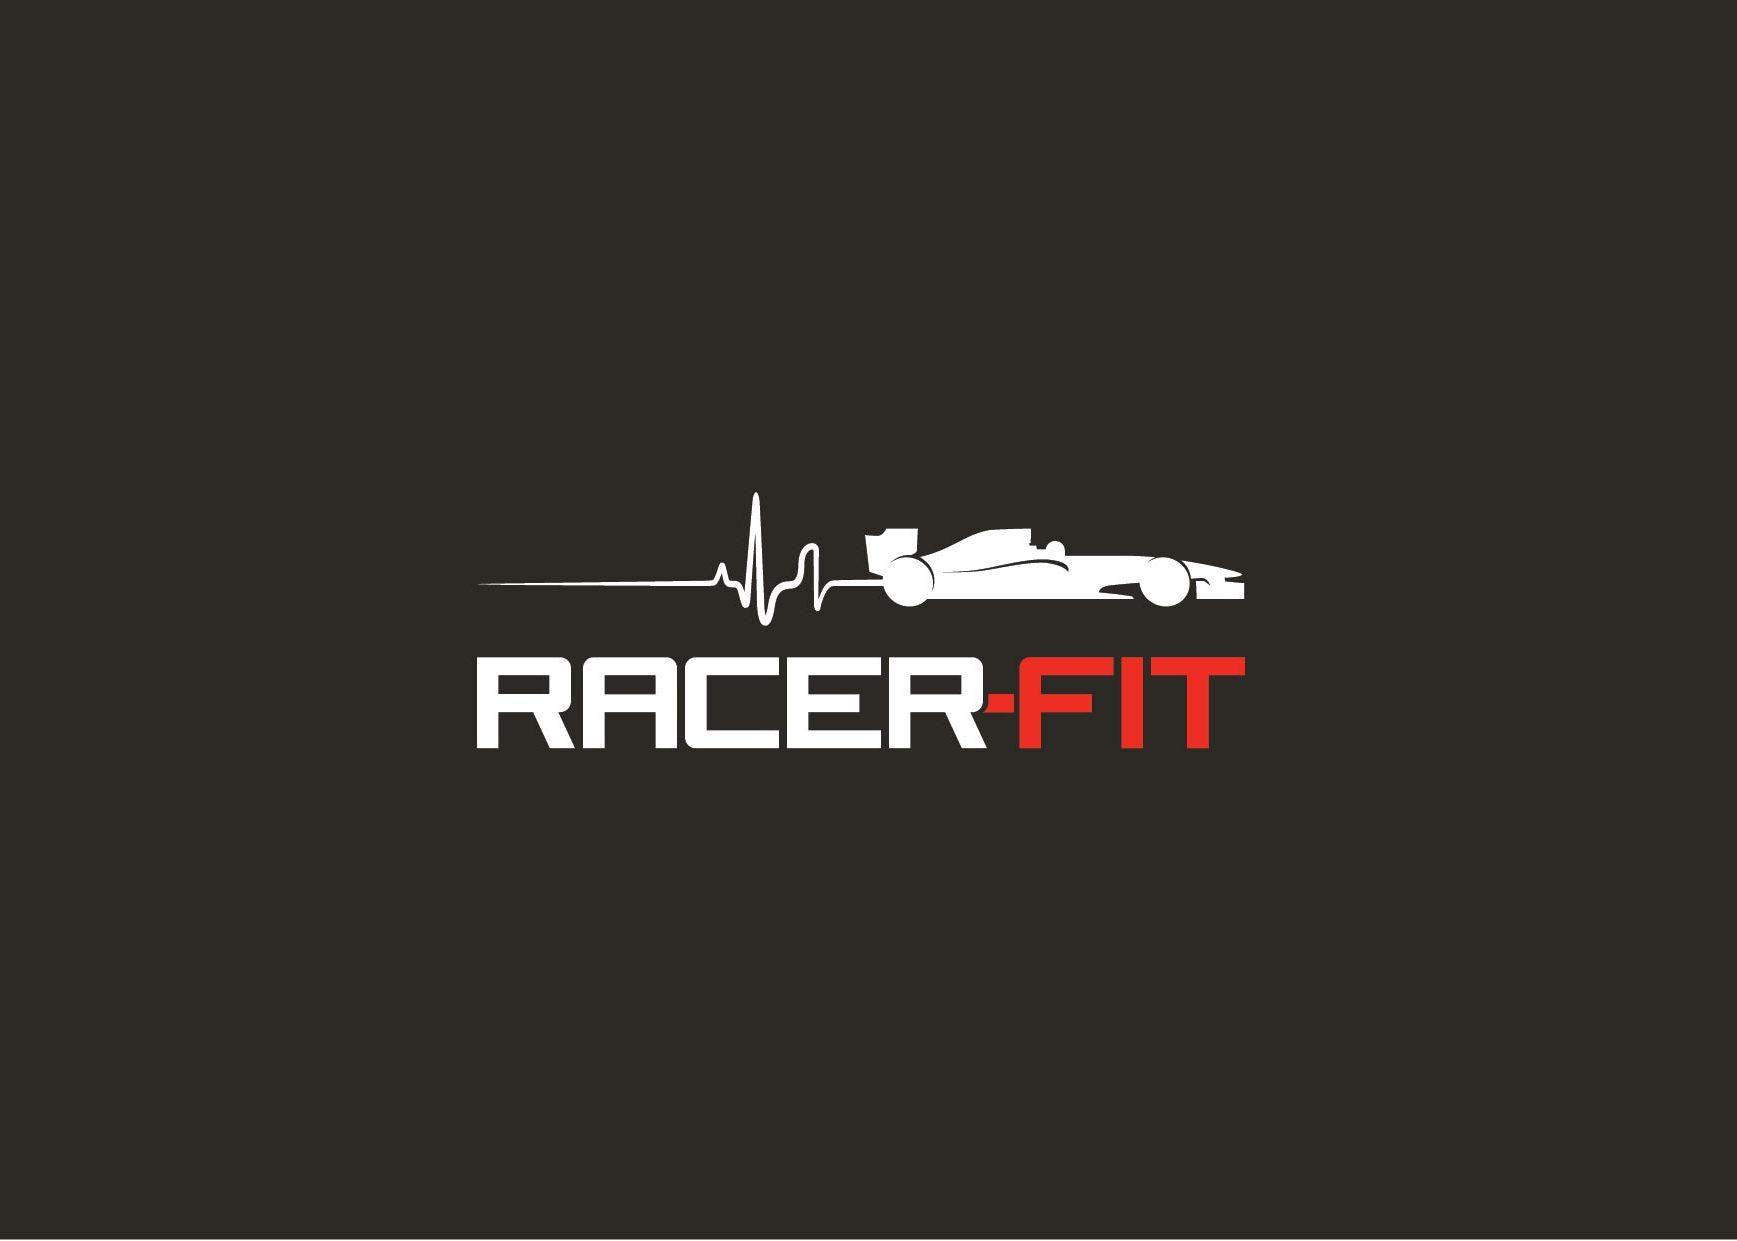 Racer-Fit